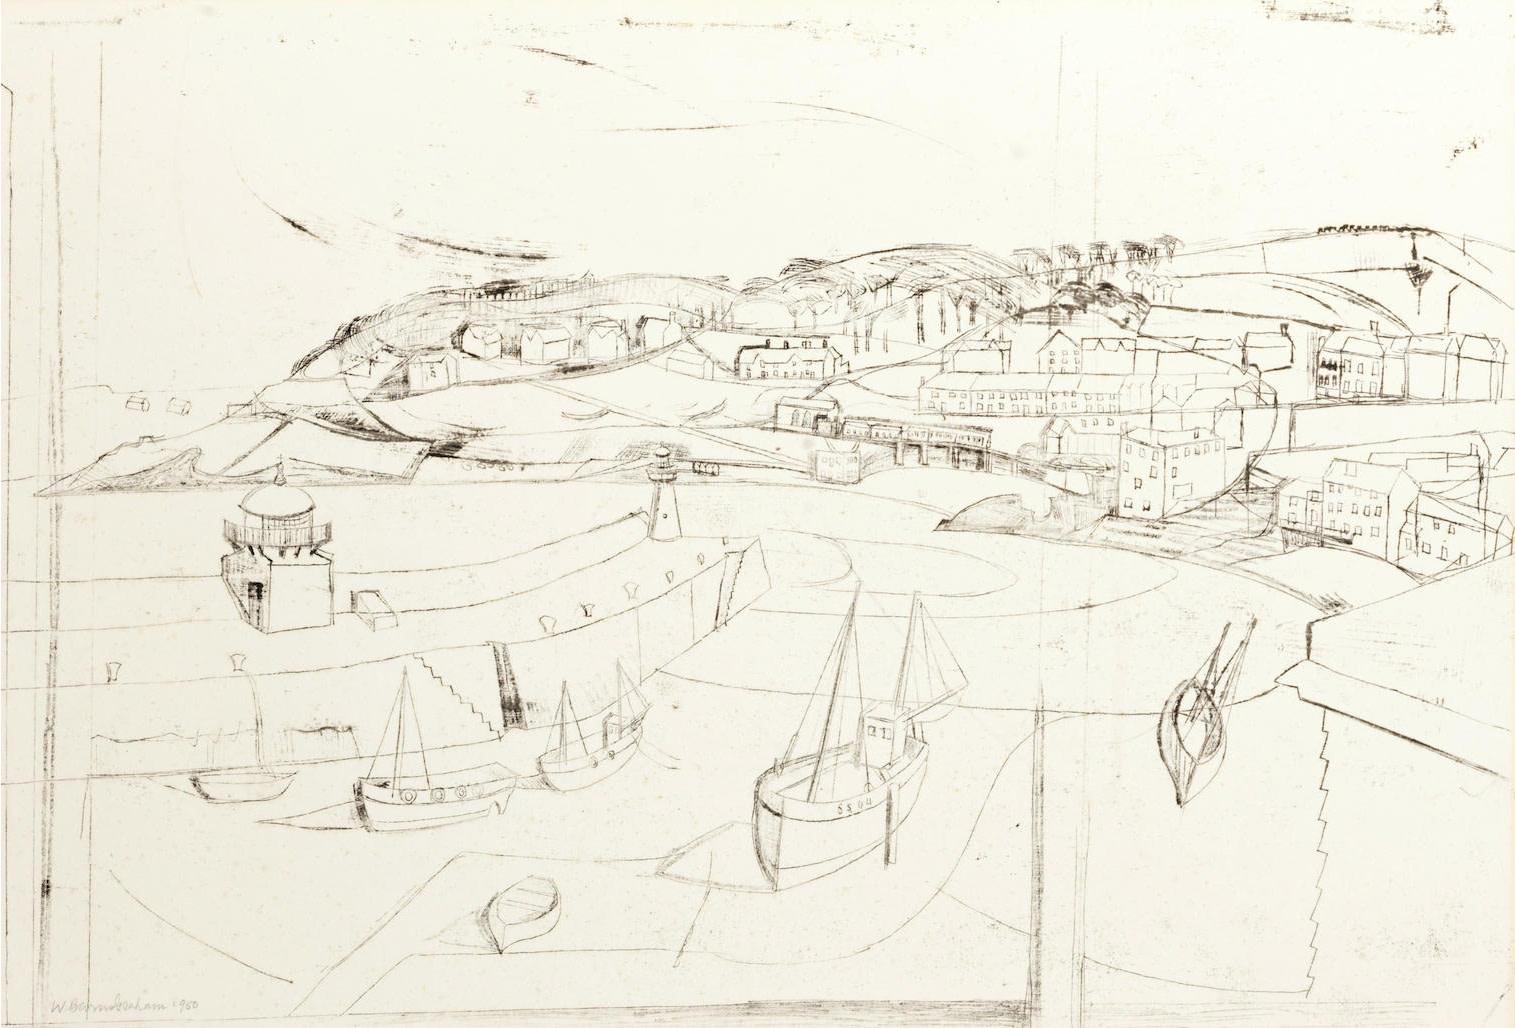 "<span class=""link fancybox-details-link""><a href=""/artists/133-wilhelmina-barns-graham-cbe/works/7316-wilhelmina-barns-graham-cbe-st-ives-1950/"">View Detail Page</a></span><div class=""artist""><strong>Wilhelmina Barns-Graham CBE</strong></div> 1912–2004 <div class=""title""><em>St Ives</em>, 1950</div> <div class=""signed_and_dated"">signed and dated in pencil </div> <div class=""medium"">monotype on wove paper</div> <div class=""dimensions"">sheet size: 39.8 x 59.5 cm</div> <div class=""edition_details"">monotype</div><div class=""copyright_line"">Copyright The Artist</div>"